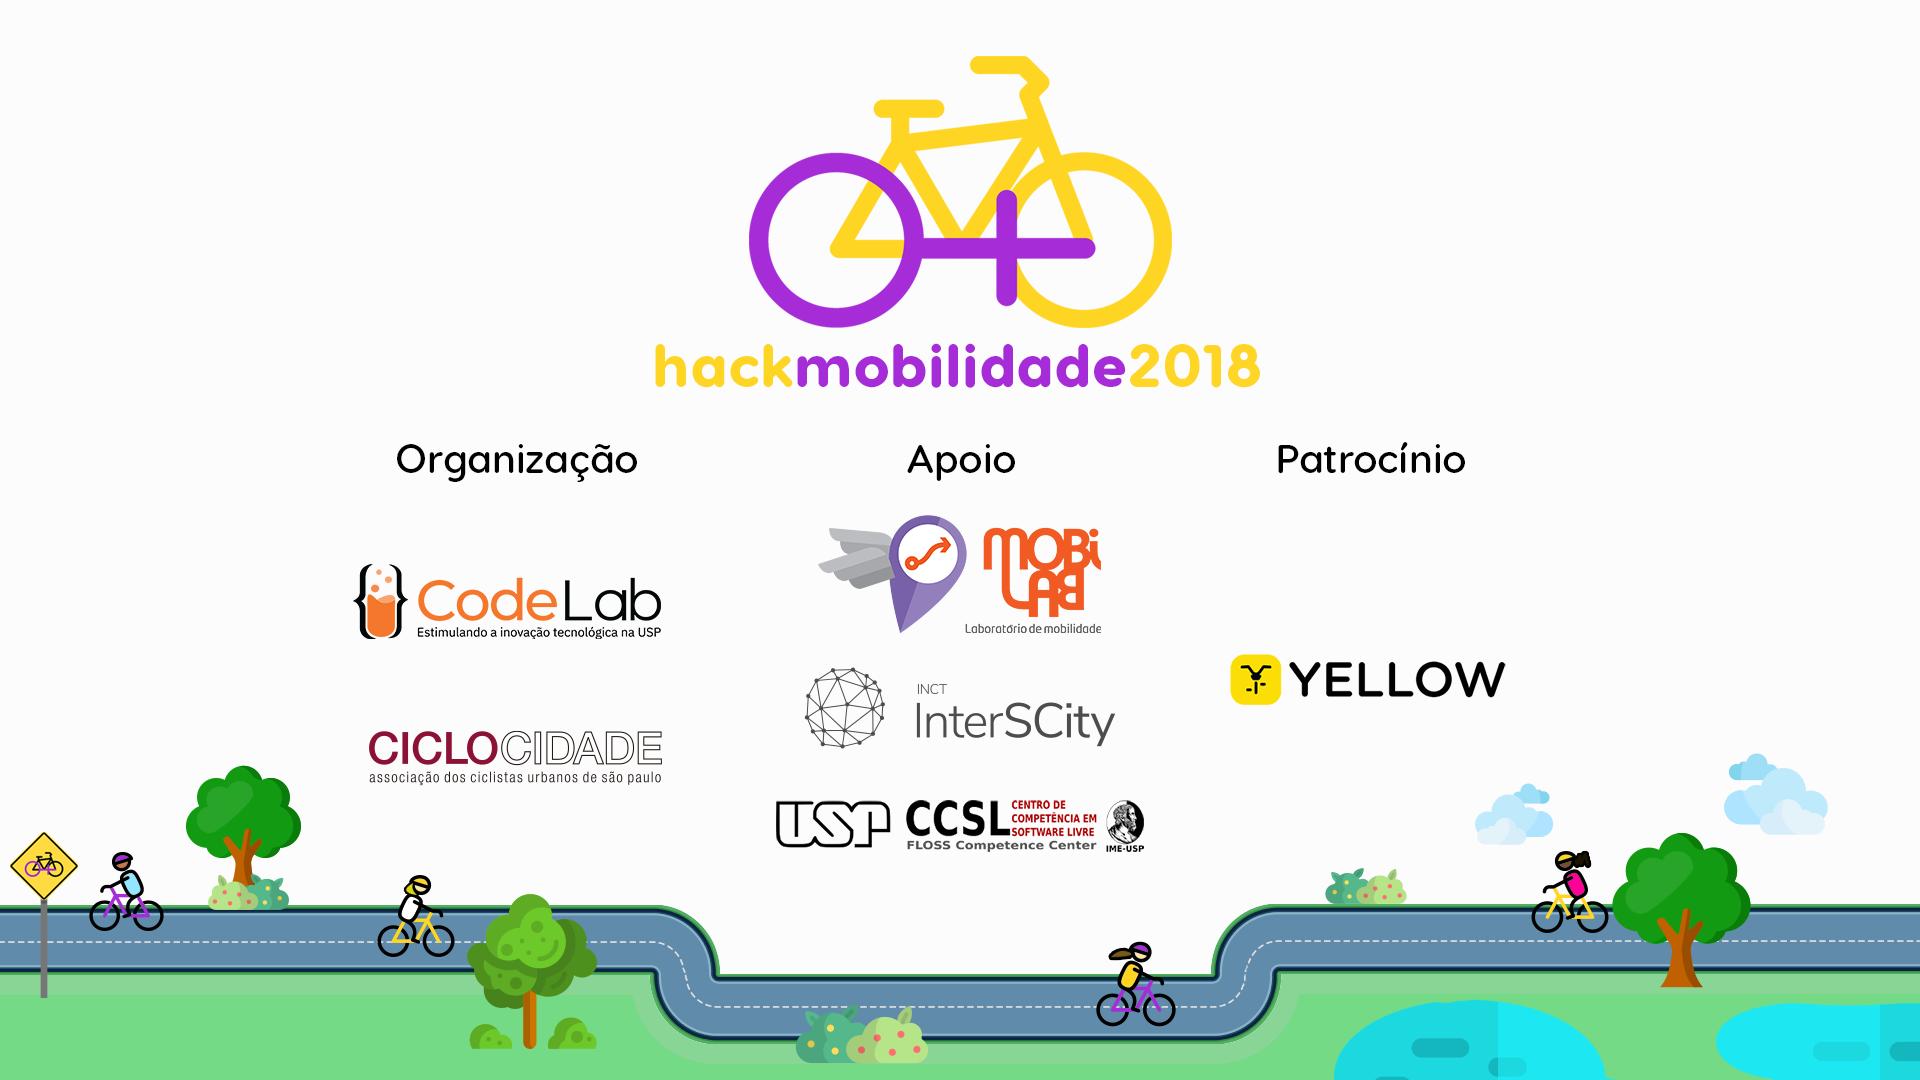 HackMobilidade 2018